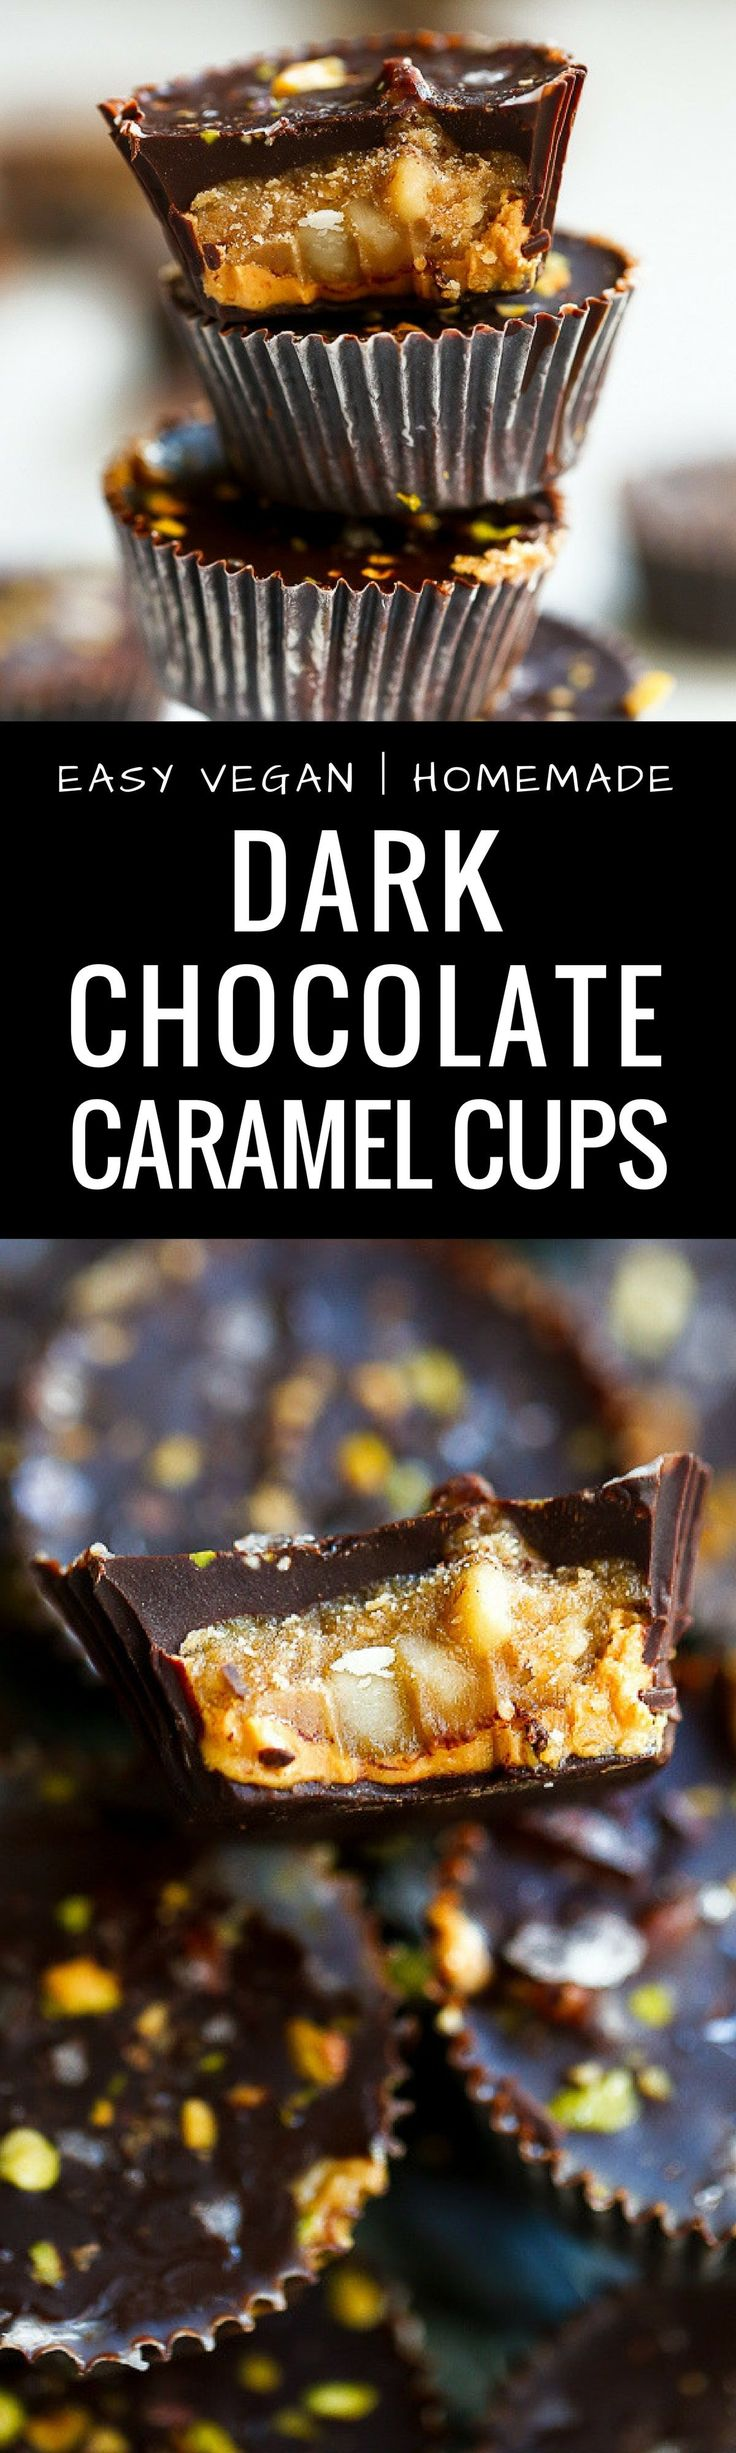 Easy Vegan Dark Chocolate Caramel Cups. These vega…